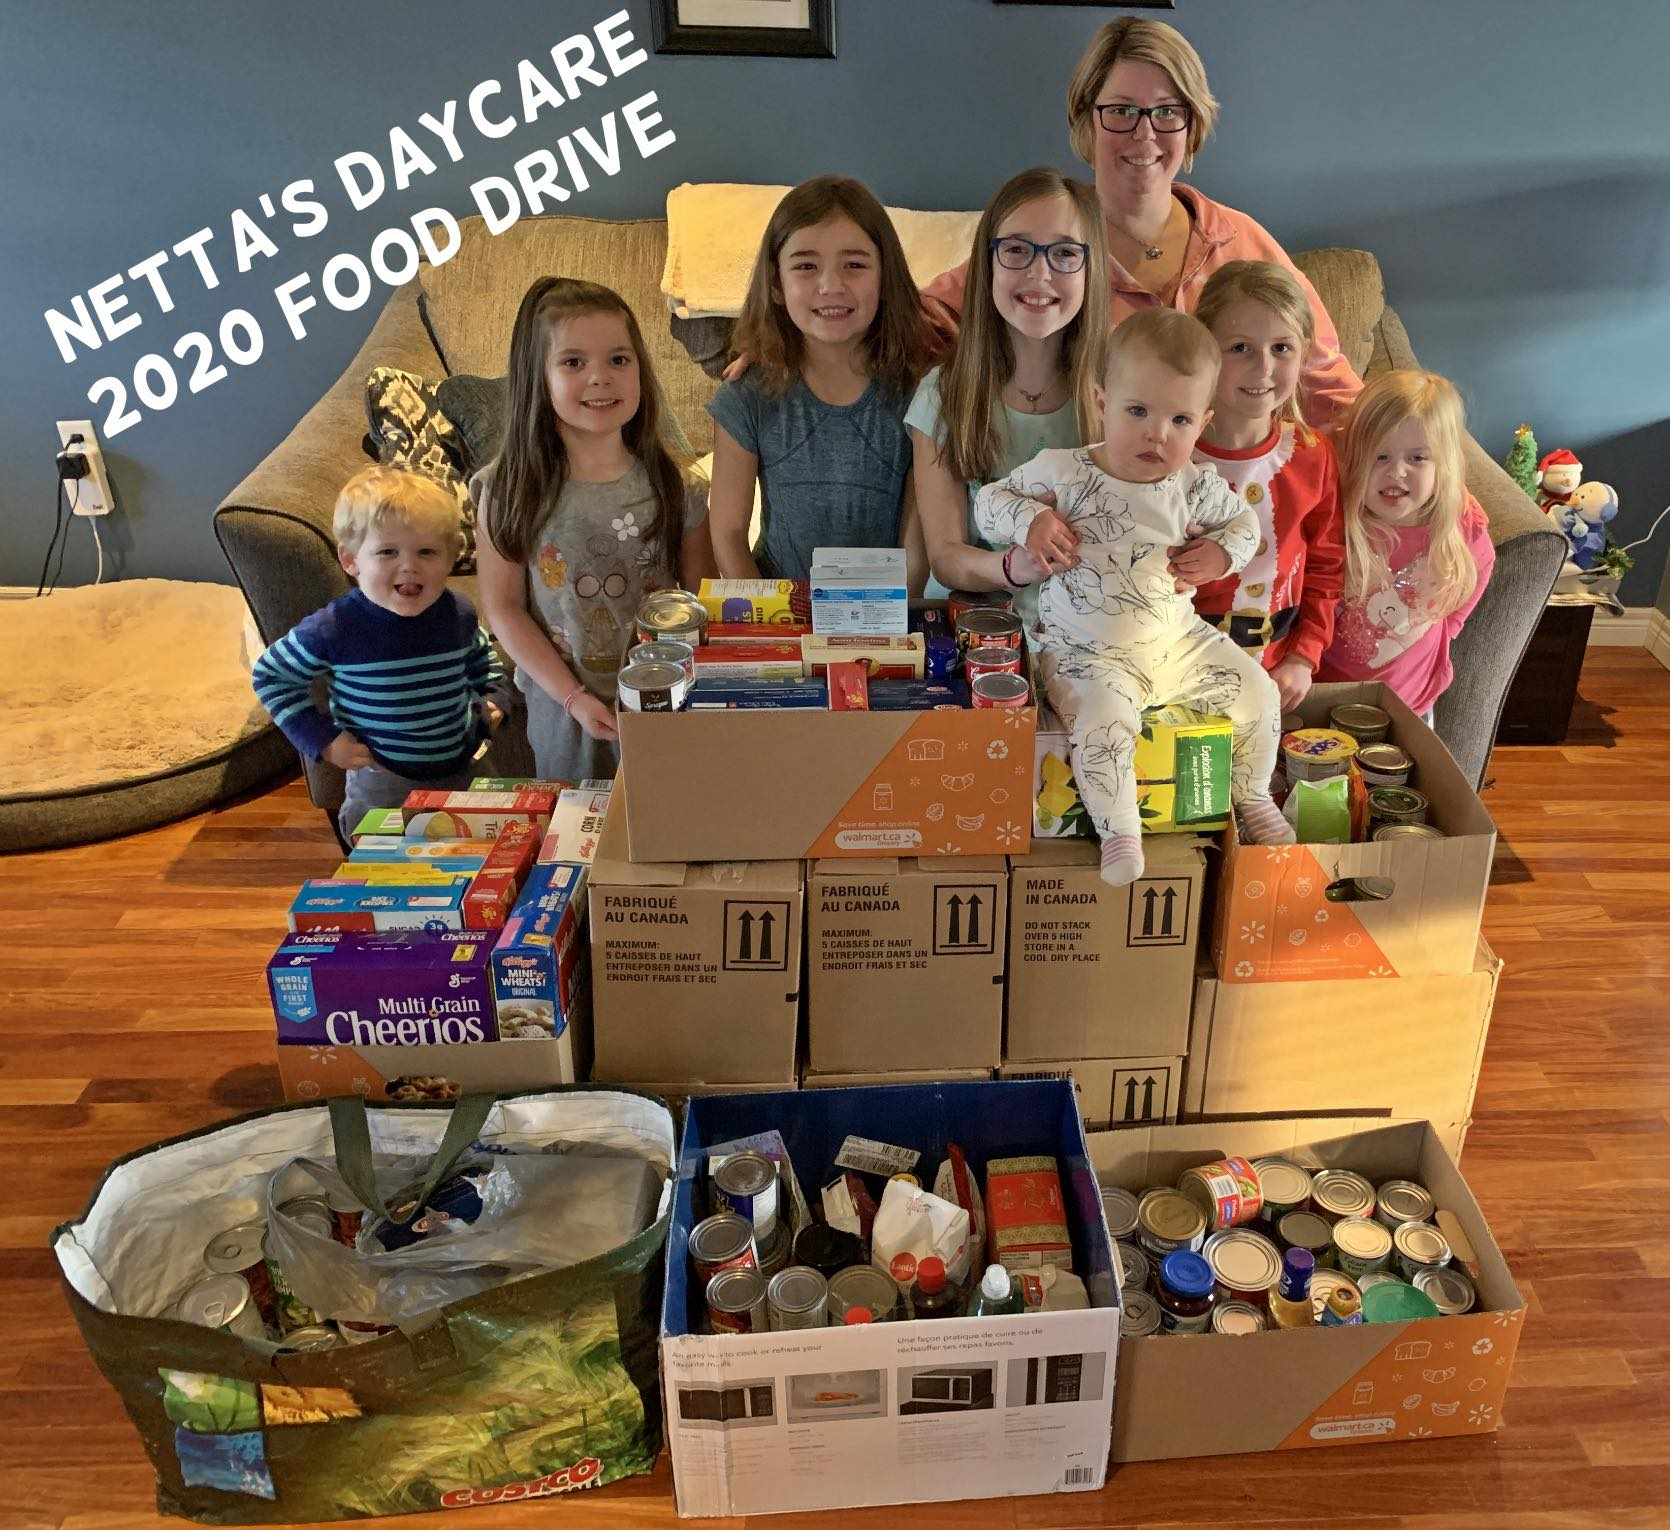 Netta's Daycare - Food Drive